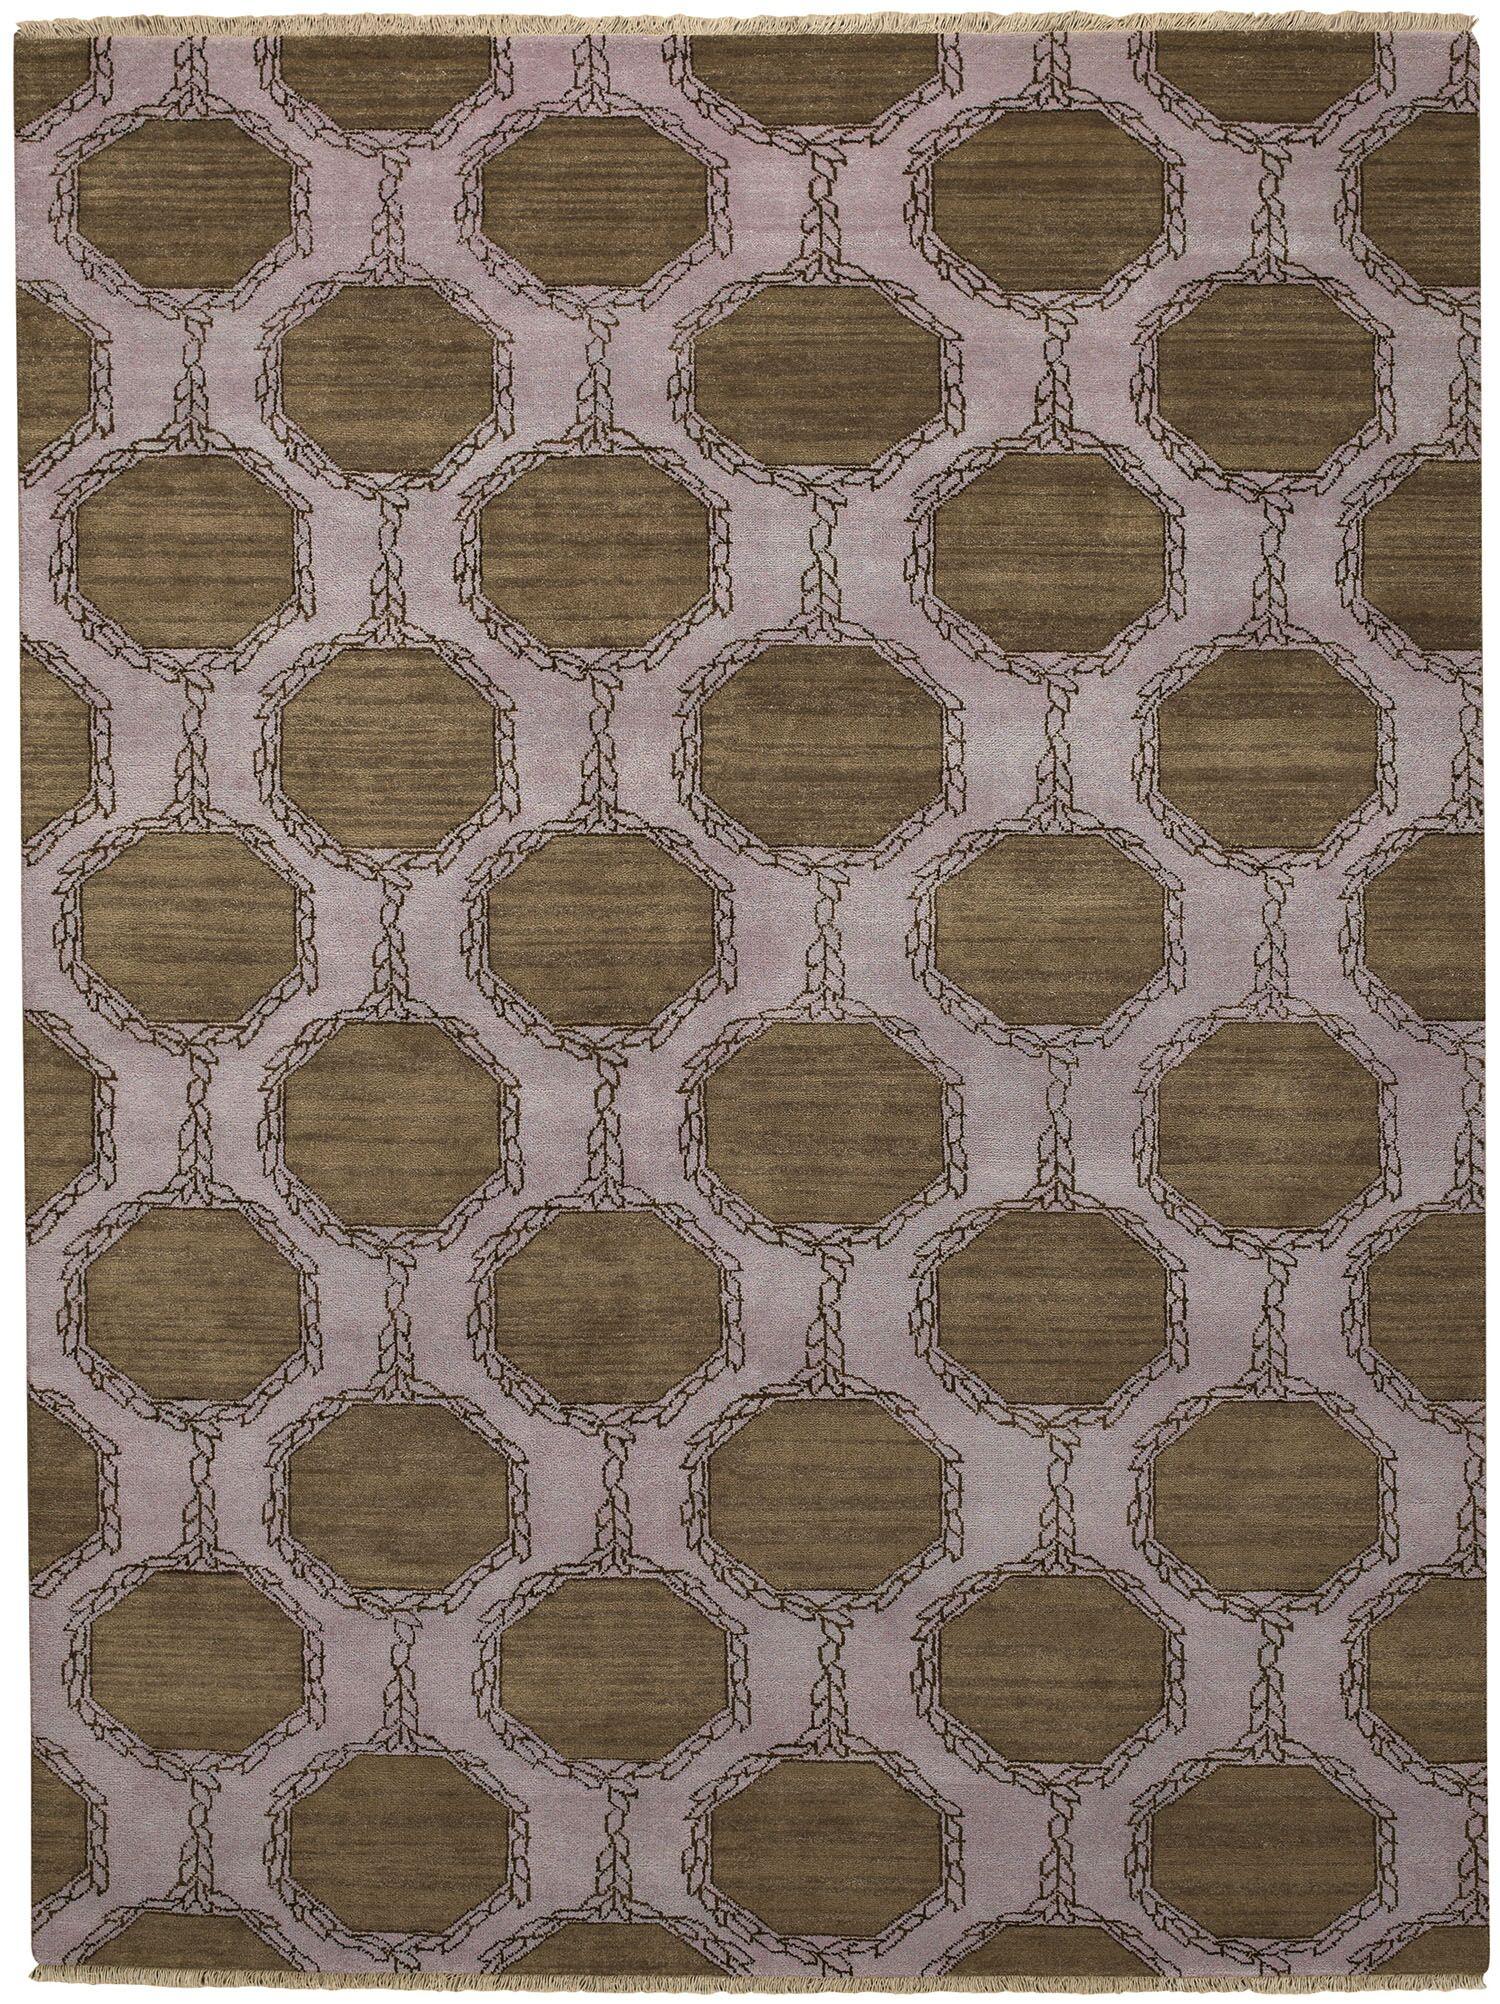 Penny Tawny Trellis Brown/Purple Area Rug Rug Size: Rectangle 8' x 11'